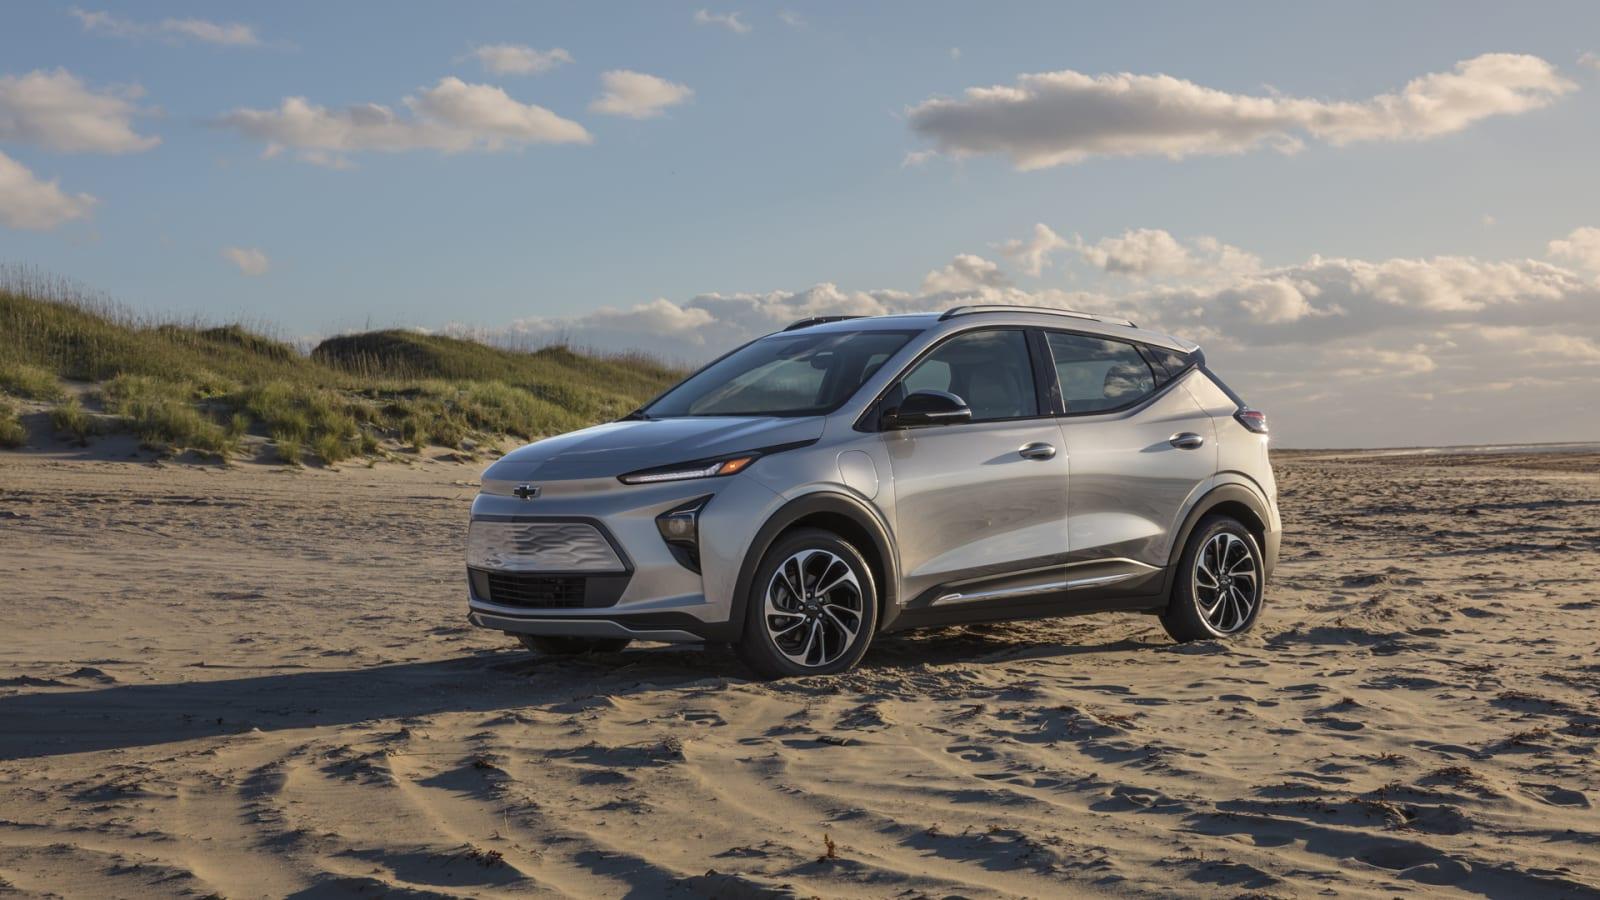 2022 Chevrolet Bolt EUV in silver